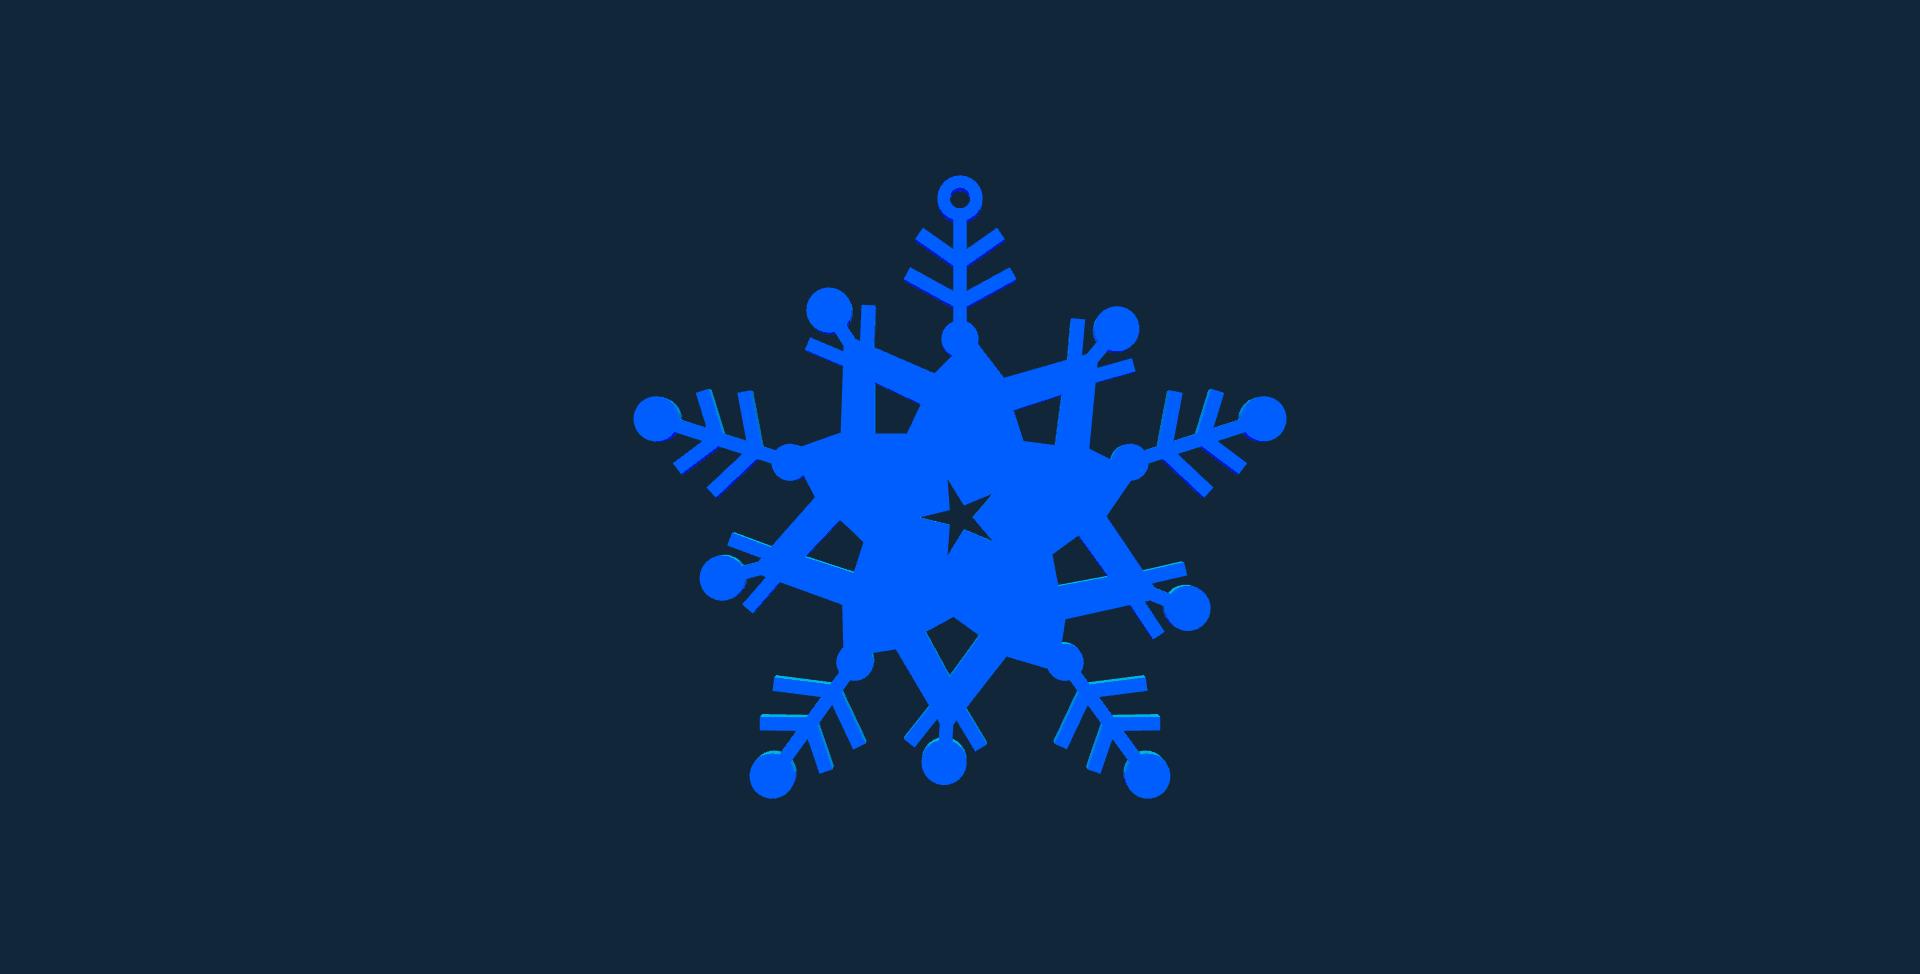 Snowflake design 3 stl file